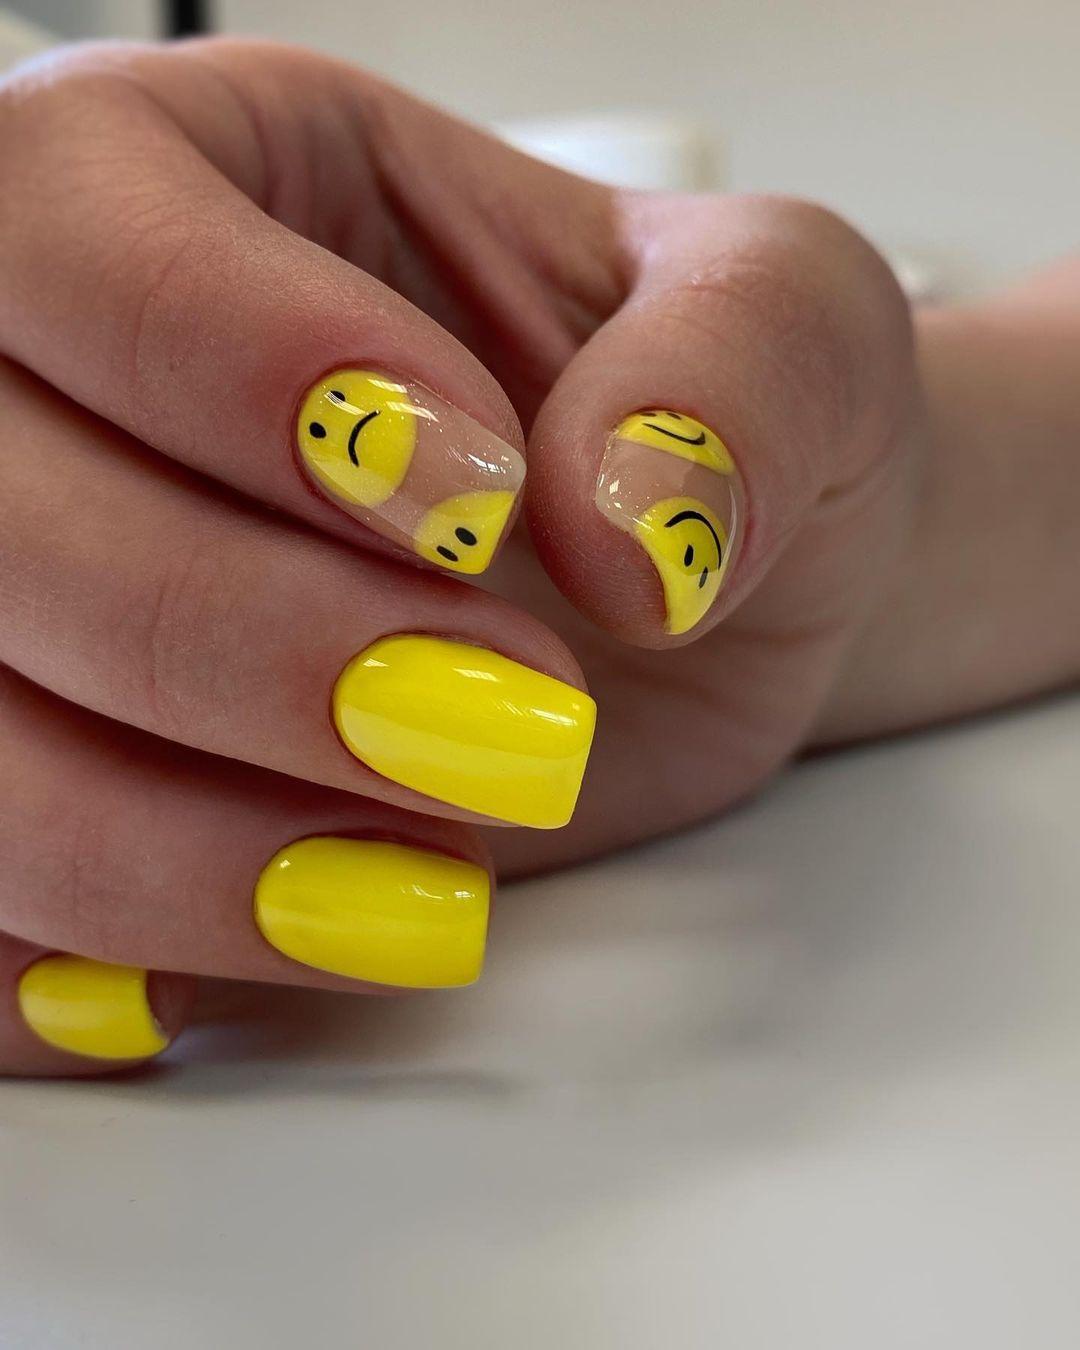 harry styles 3 nails